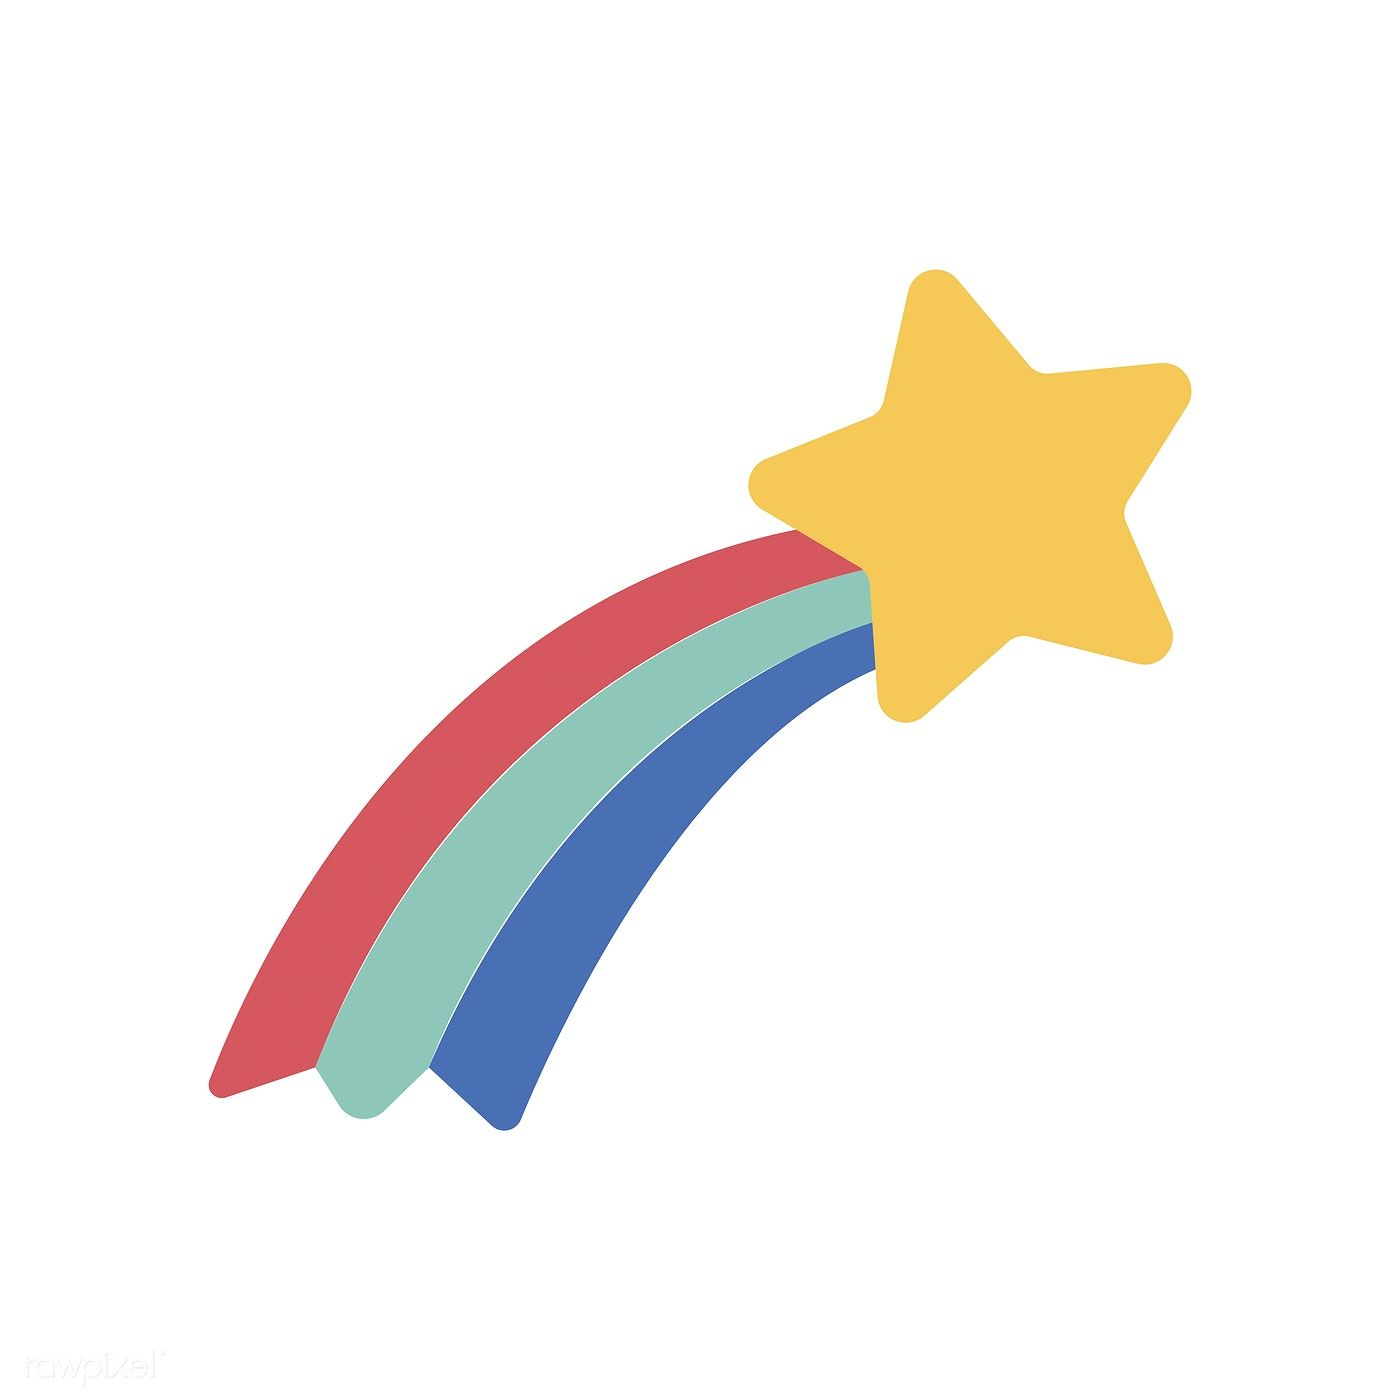 Illustration Of Shooting Star Icon Free Image By Rawpixel Com Fantasiereisen Fur Kinder Sternschnuppen Fantasiereisen